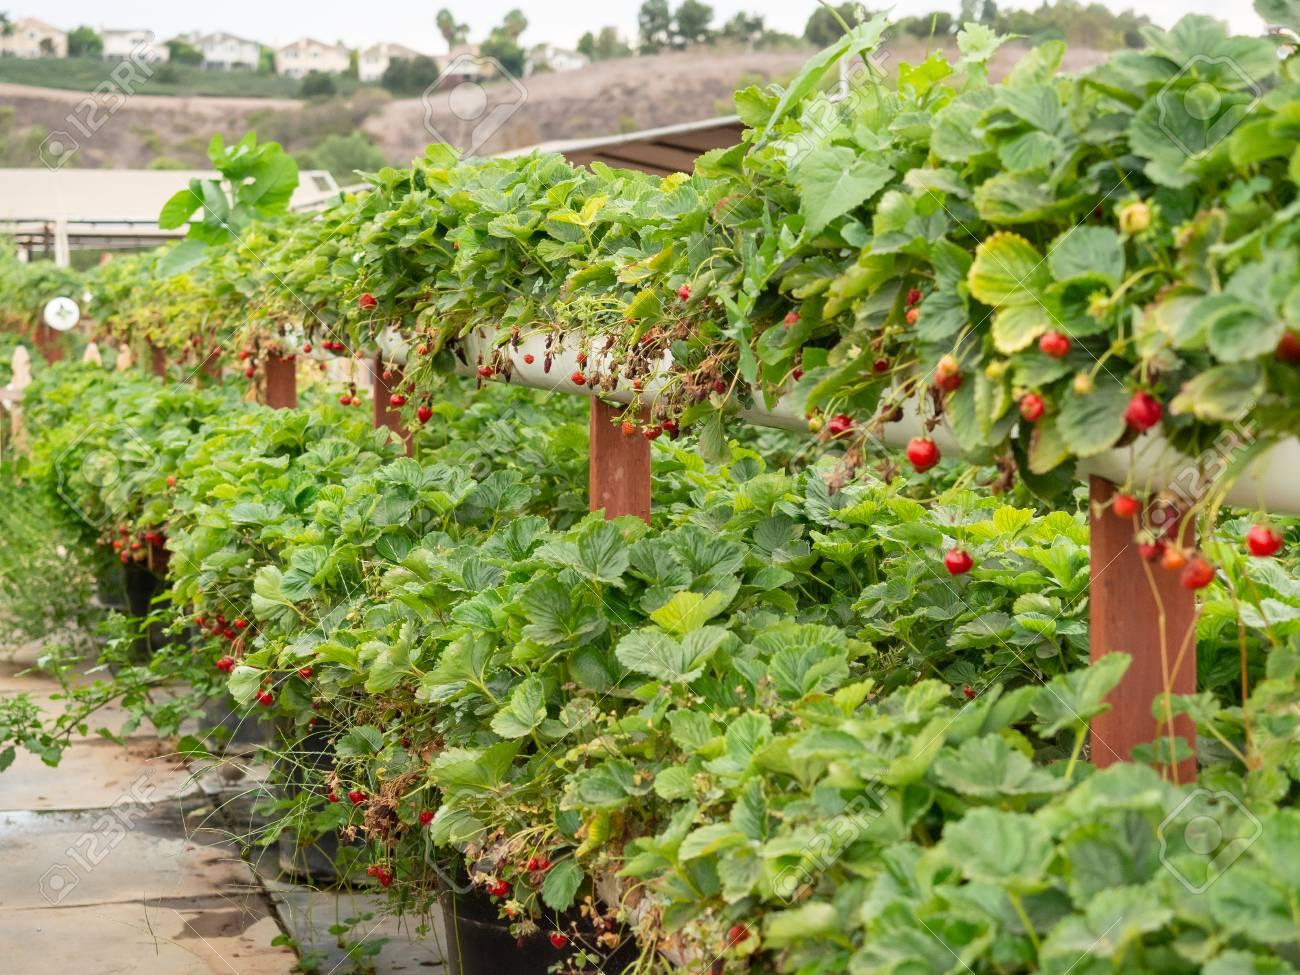 Organic strawberry growing on hydroponic farm outside - 115343667